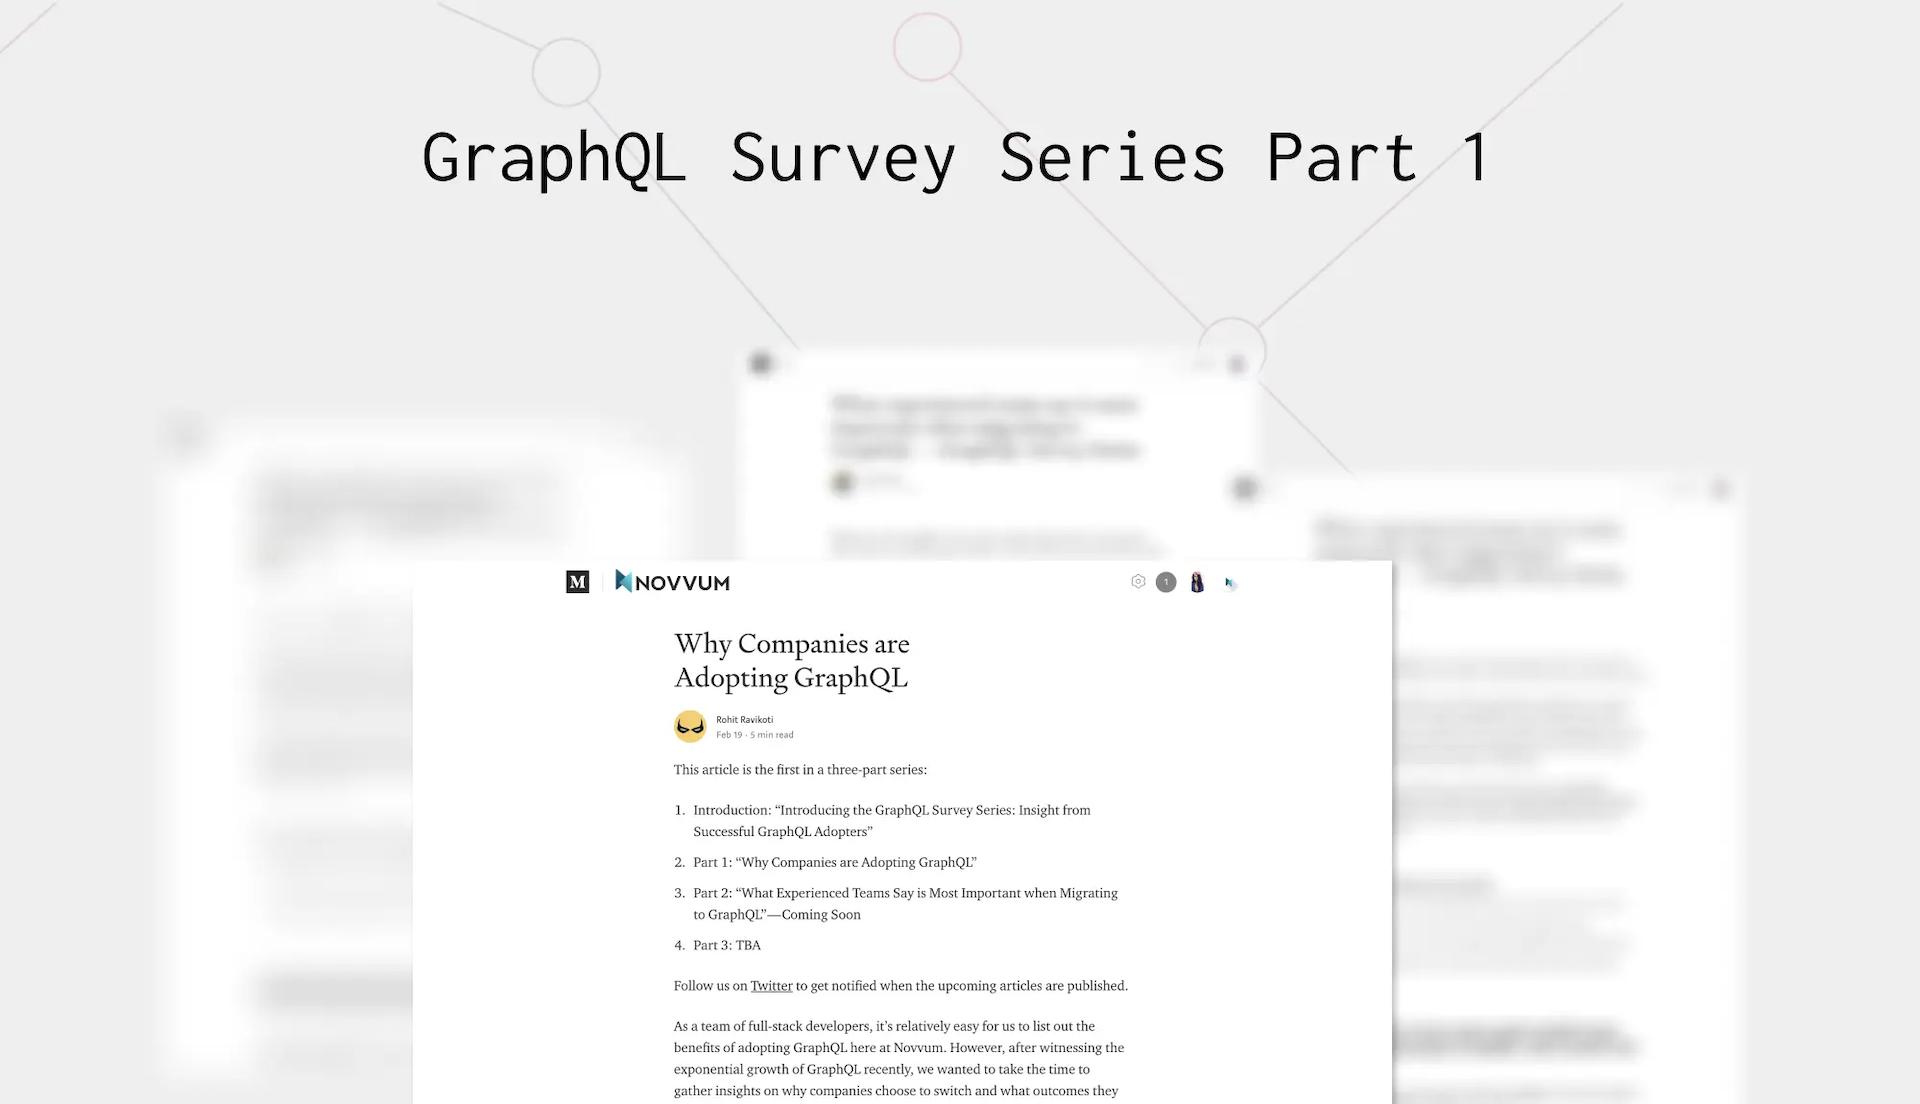 Why Companies are Adopting GraphQL